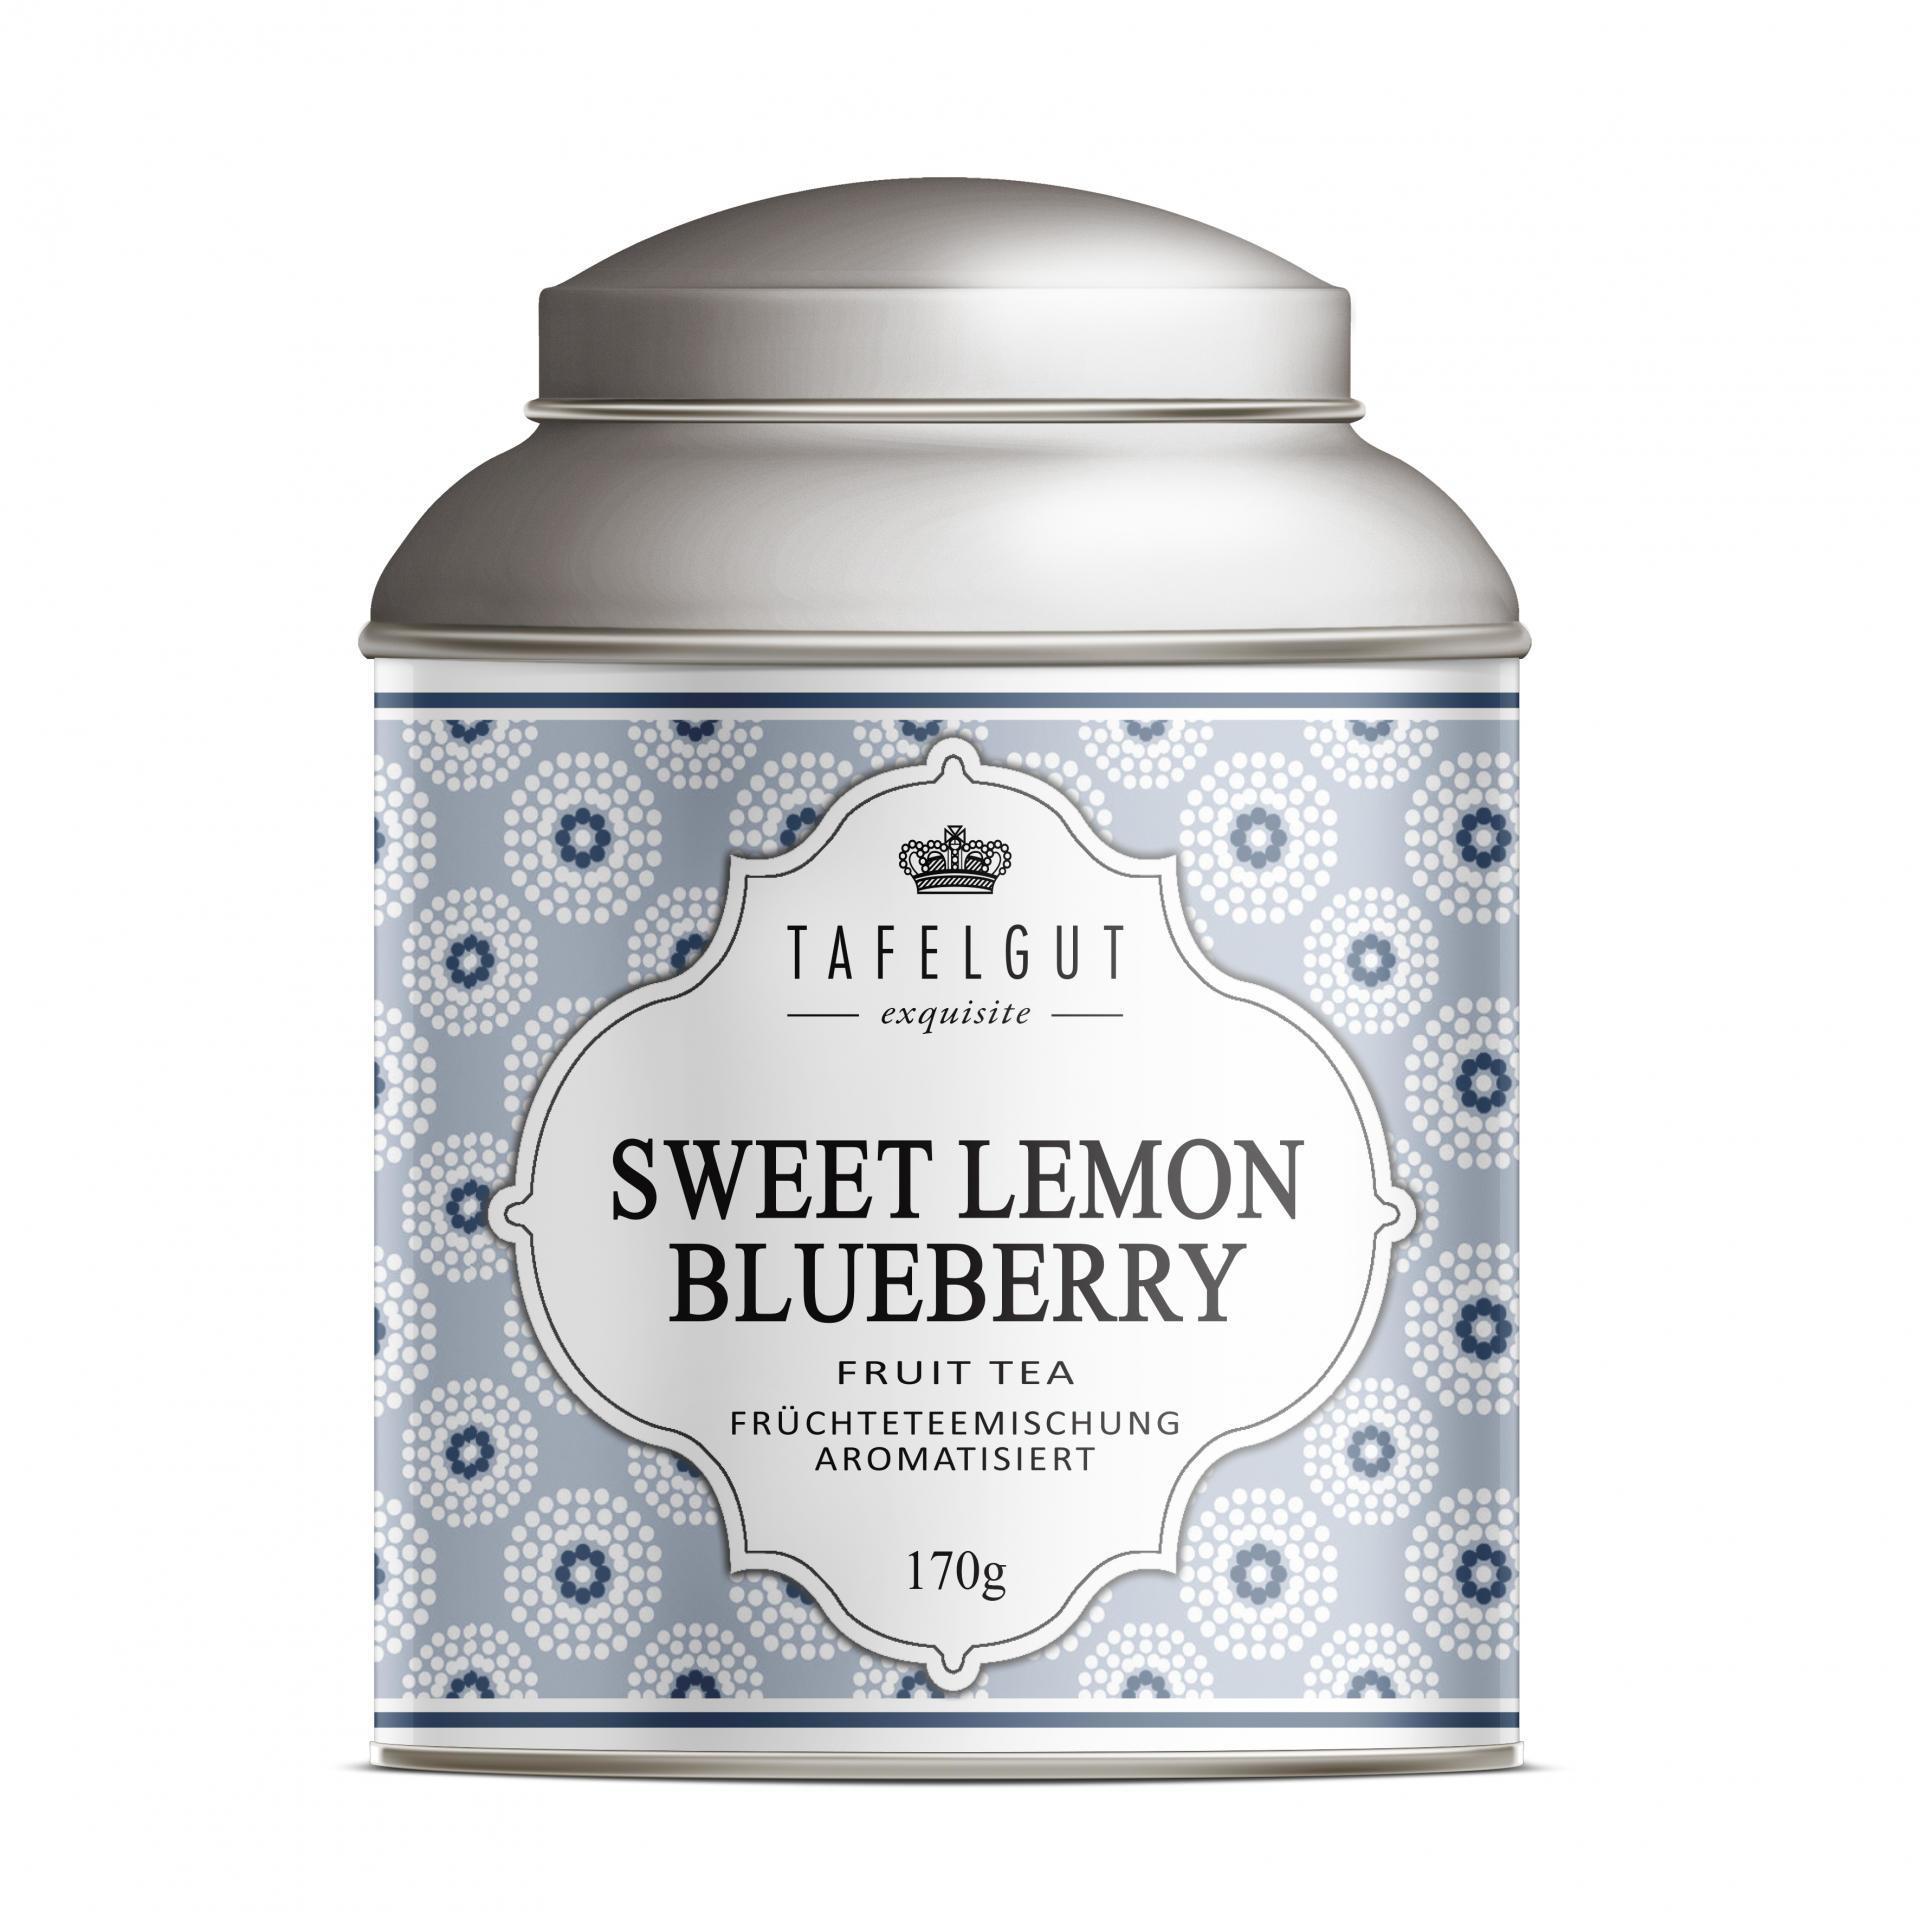 TAFELGUT Ovocný čaj Sweet Lemon Blueberry - 170gr, modrá barva, kov